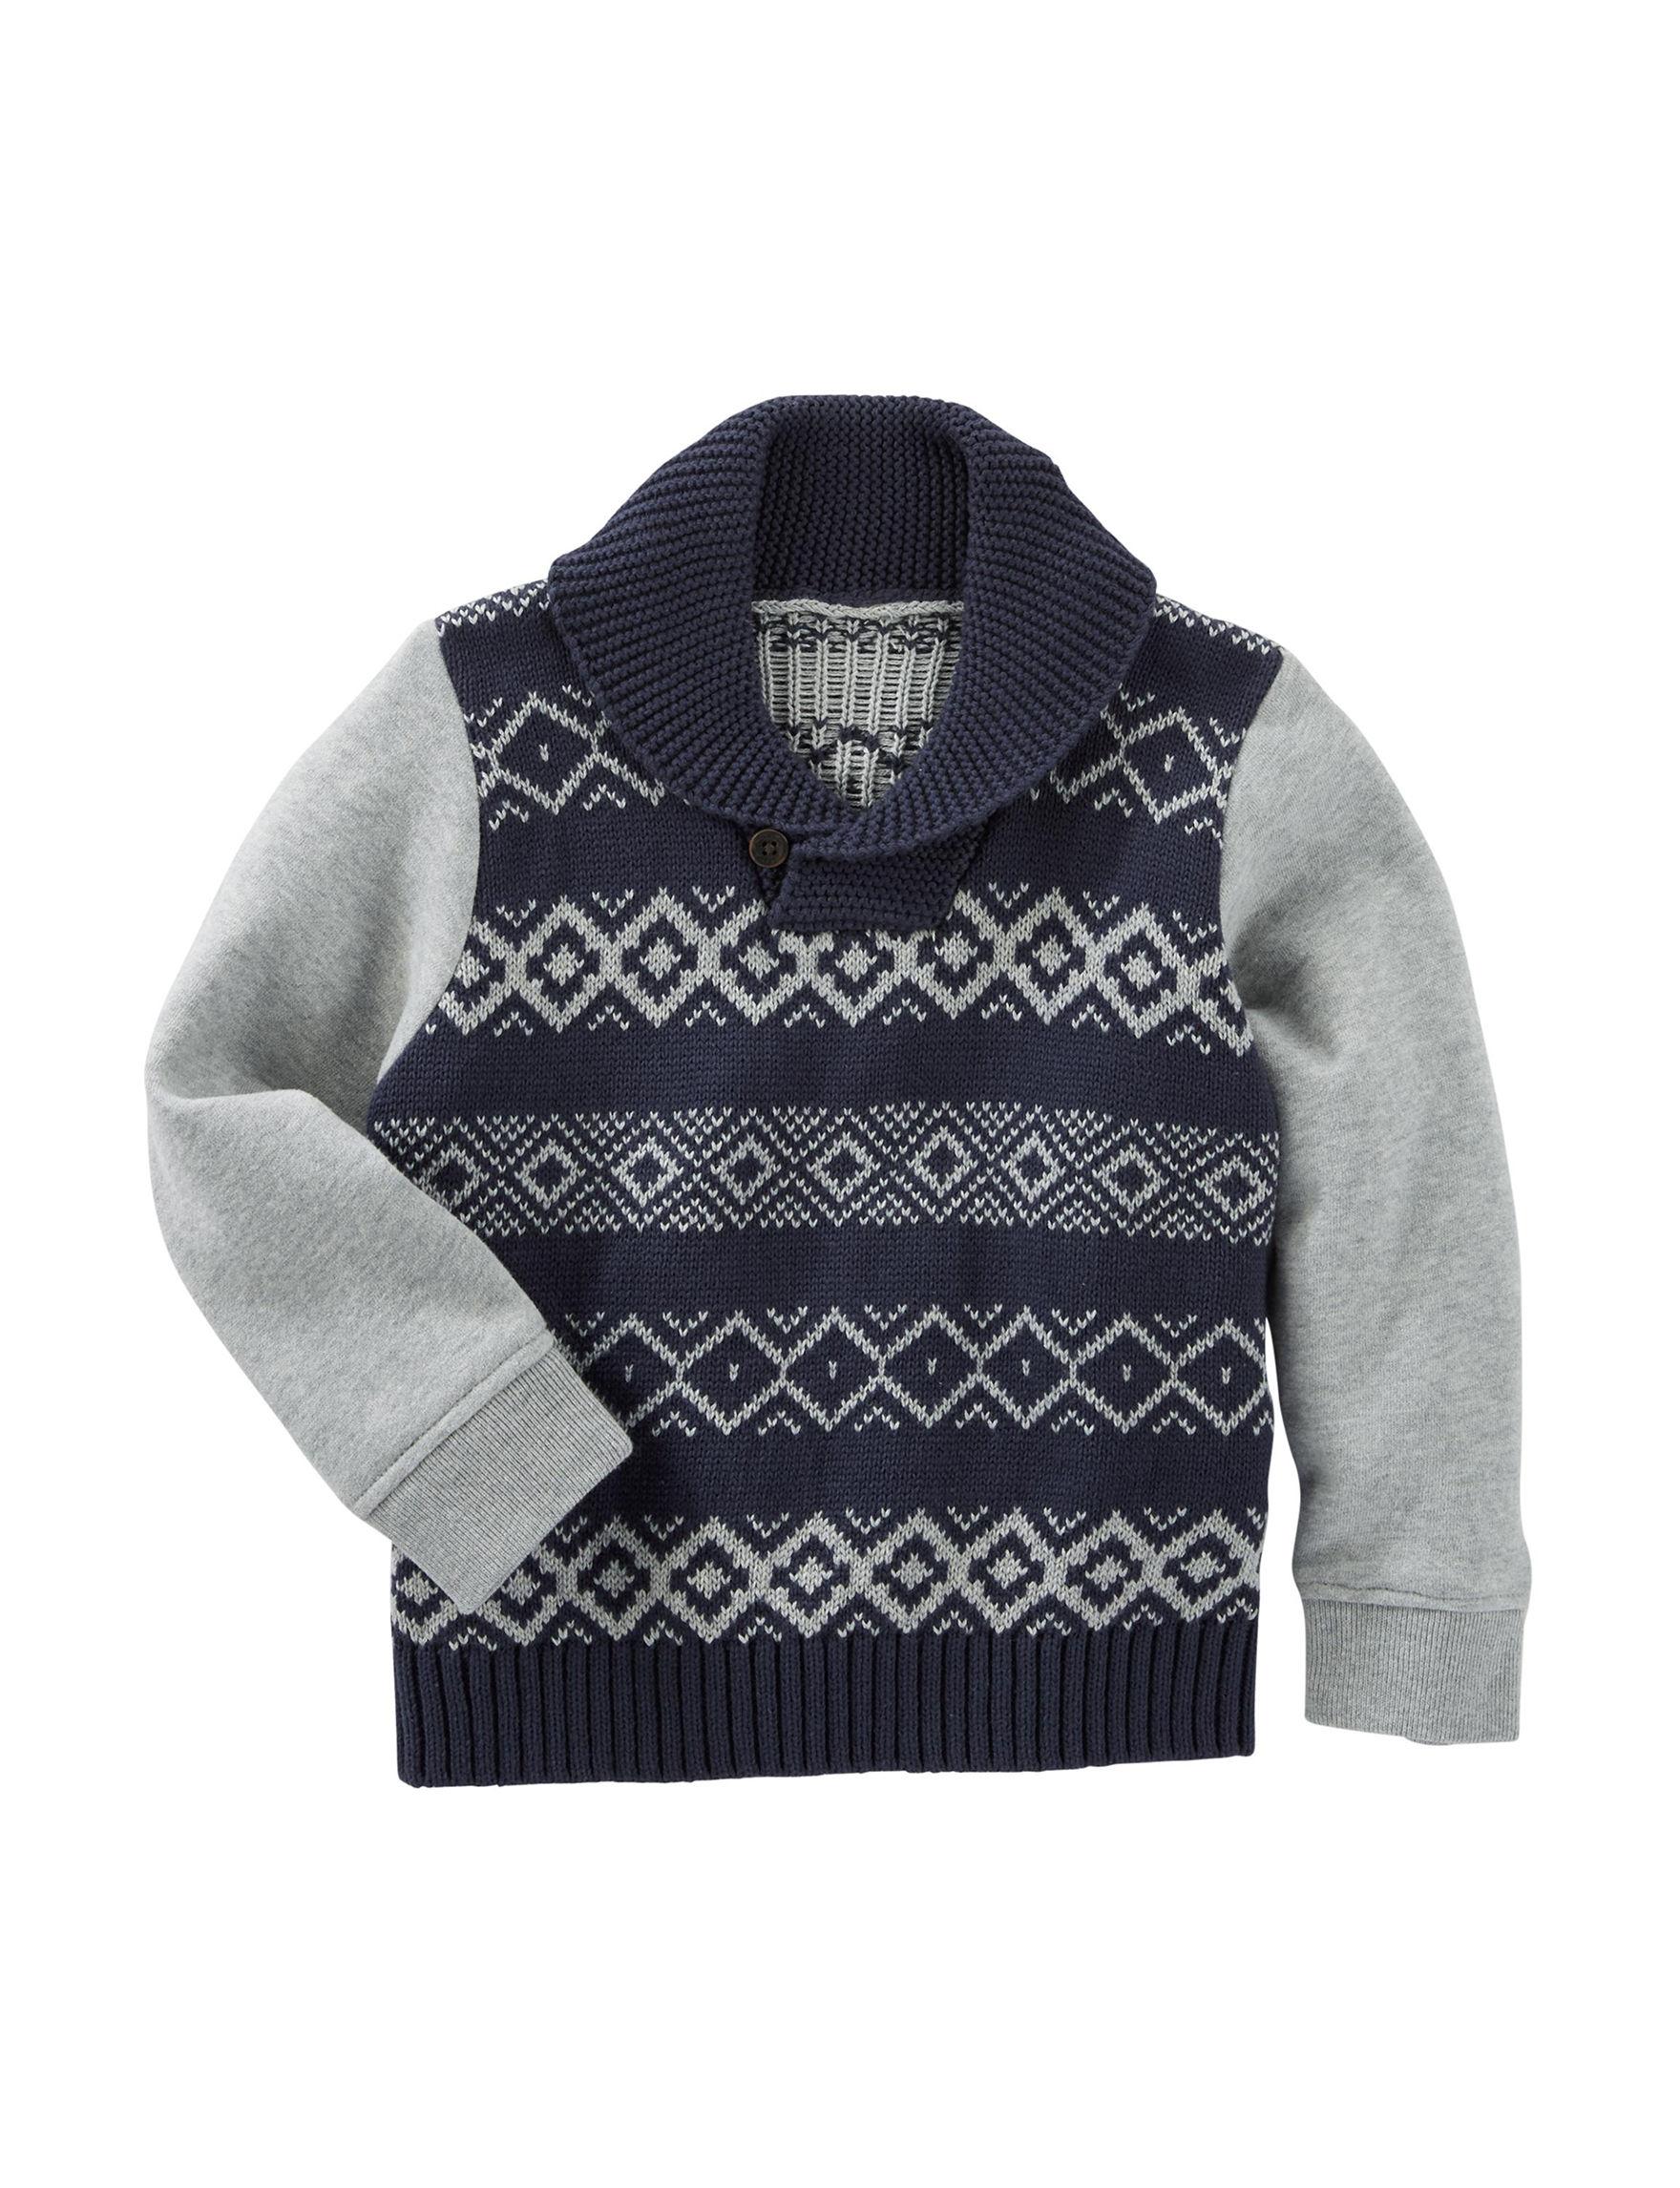 OshKosh B'gosh® Fair Isle Print Sweater - Boys 4-7 | Stage Stores